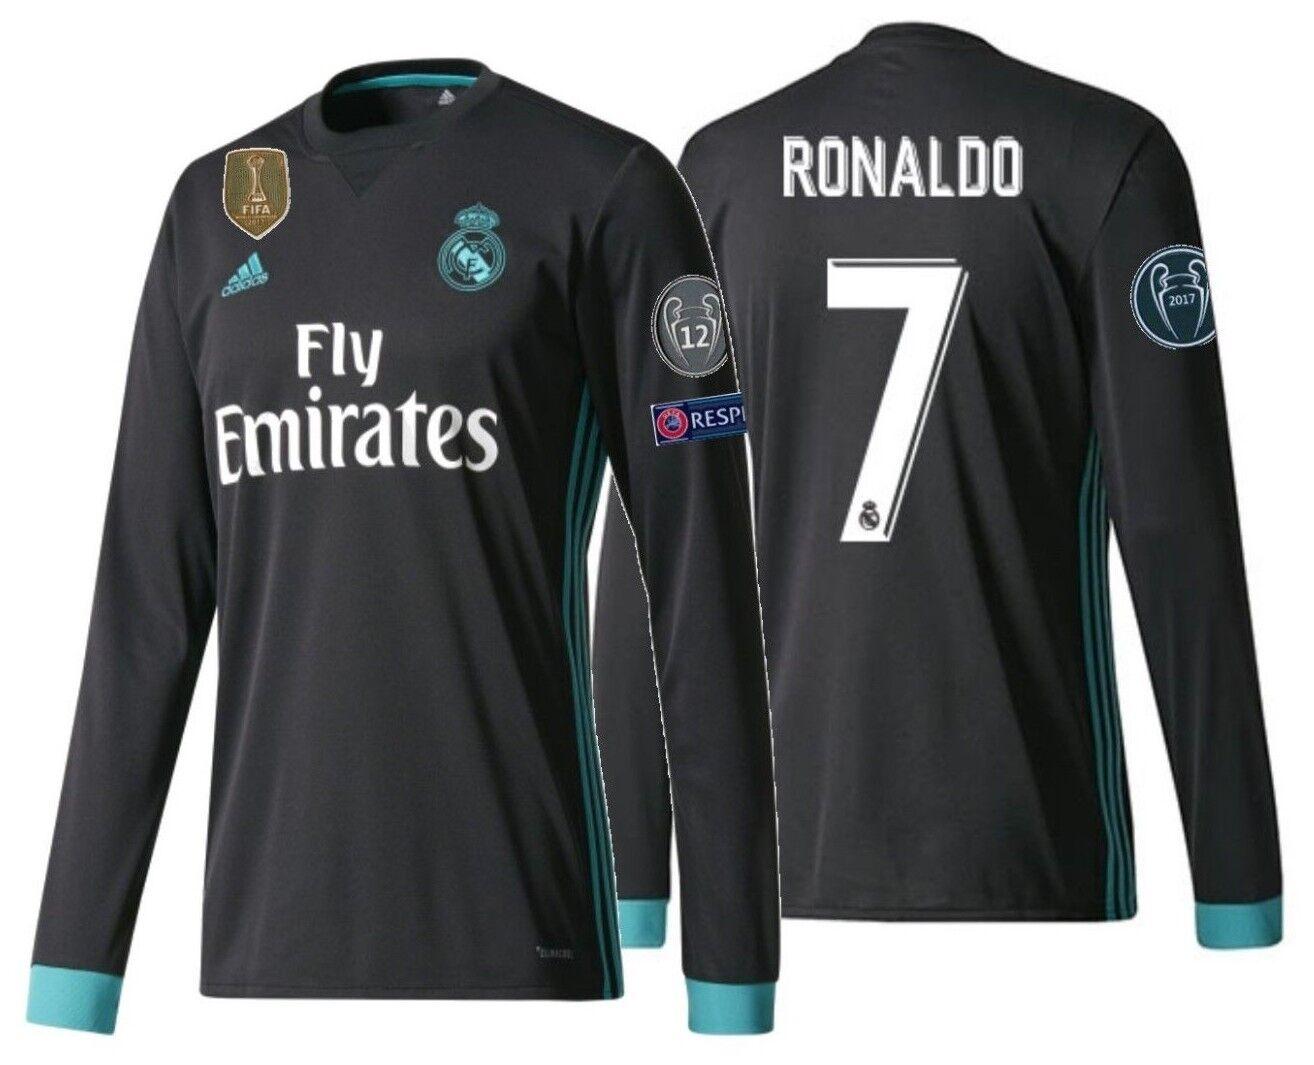 Adidas C. Ronaldo Real Madrid UEFA Liga de Campeones Ls Away Jersey 2017 18